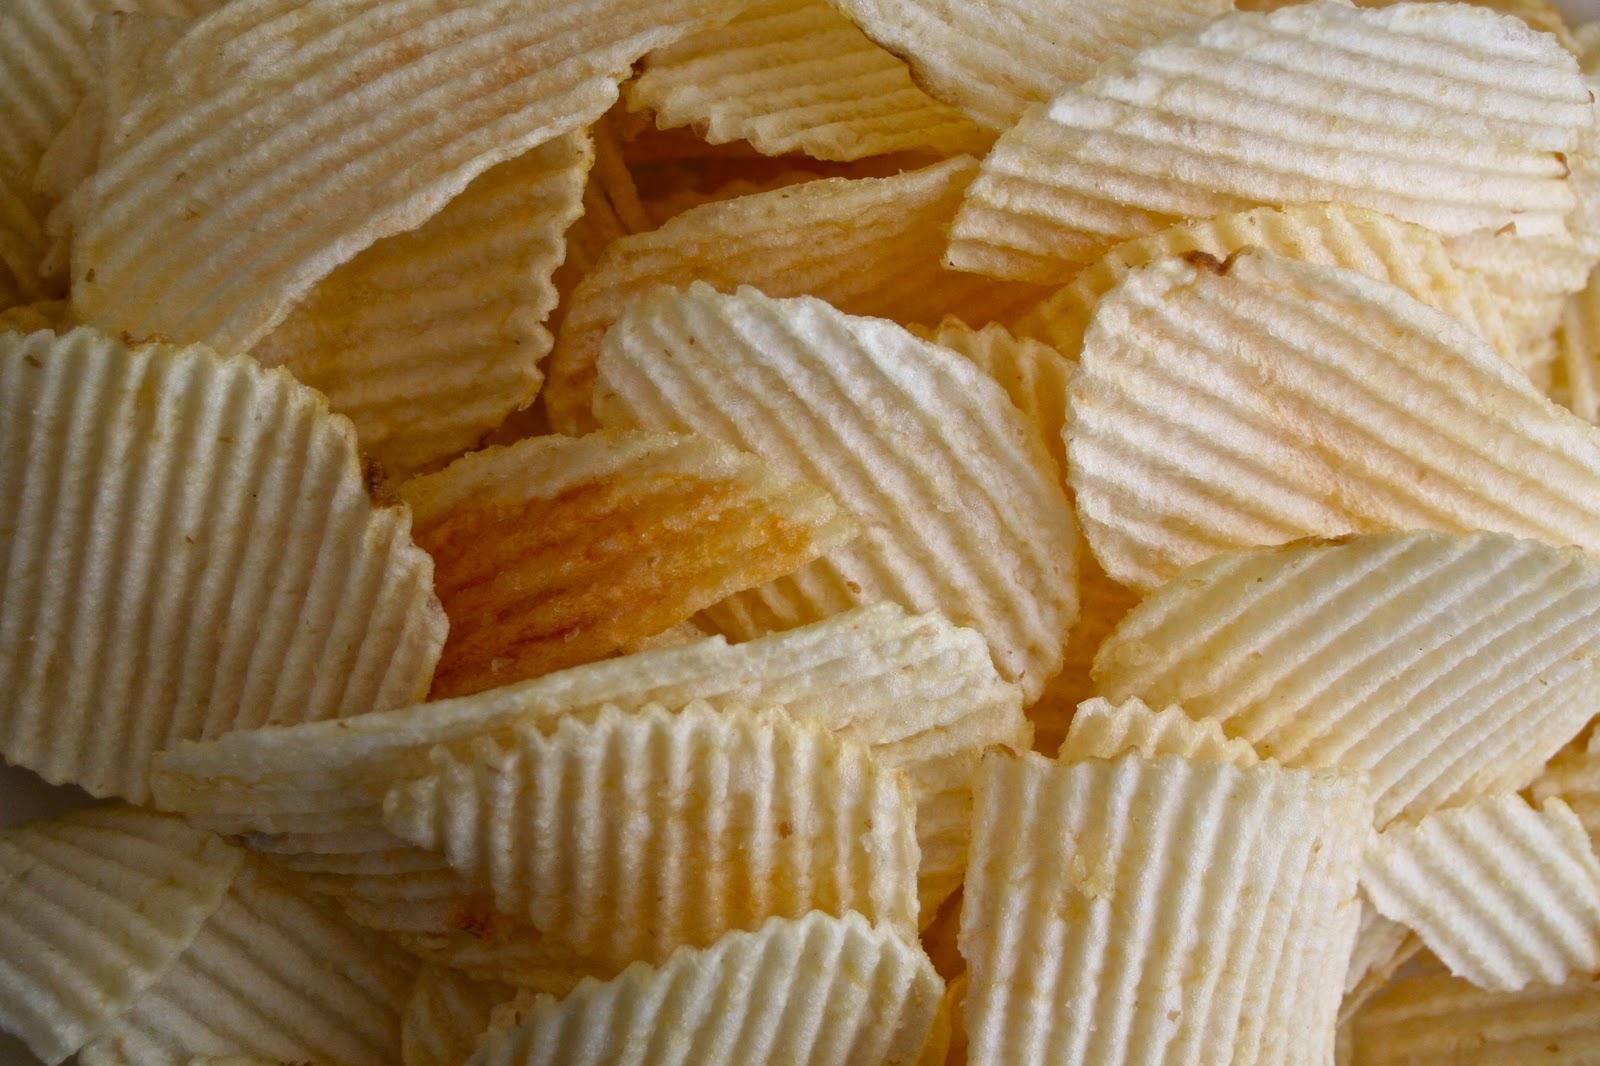 chips with ridges da bess chips